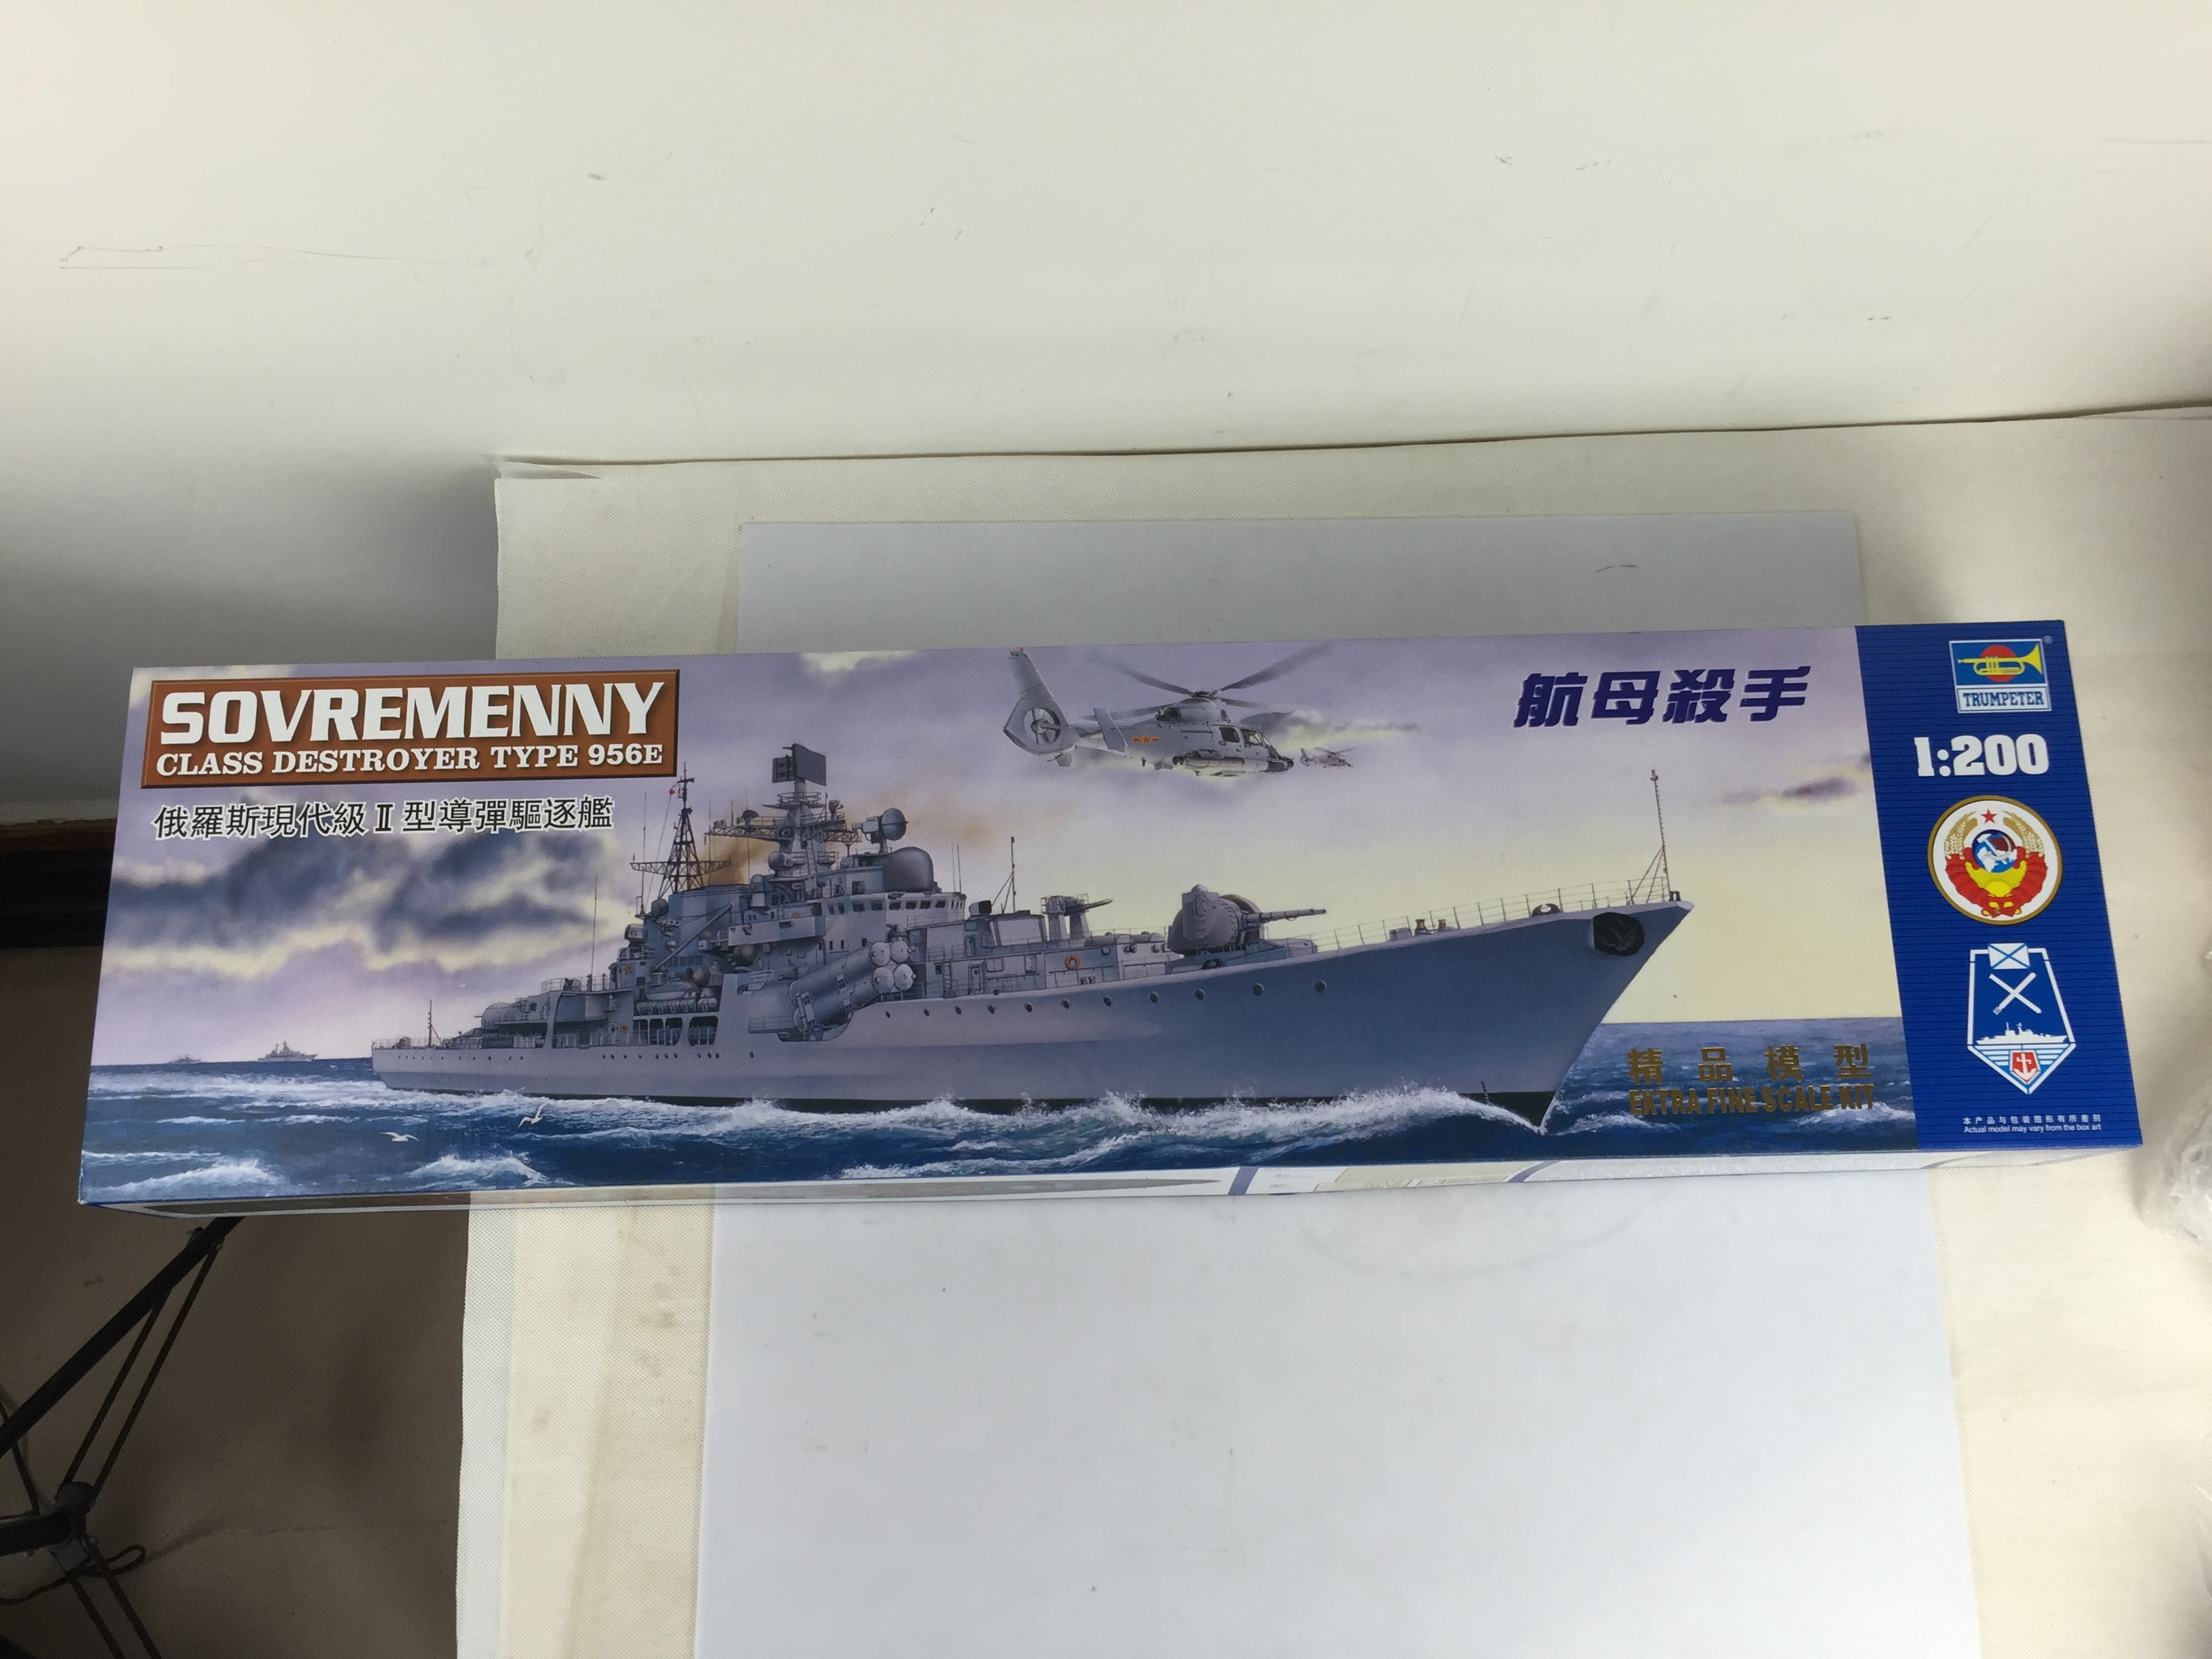 Trumpeter 03613 1/200 روسيا Sovremenny النوع الثاني سفينة حربية مكافحة السفينة نموذج ثابت TH06821-SMT6